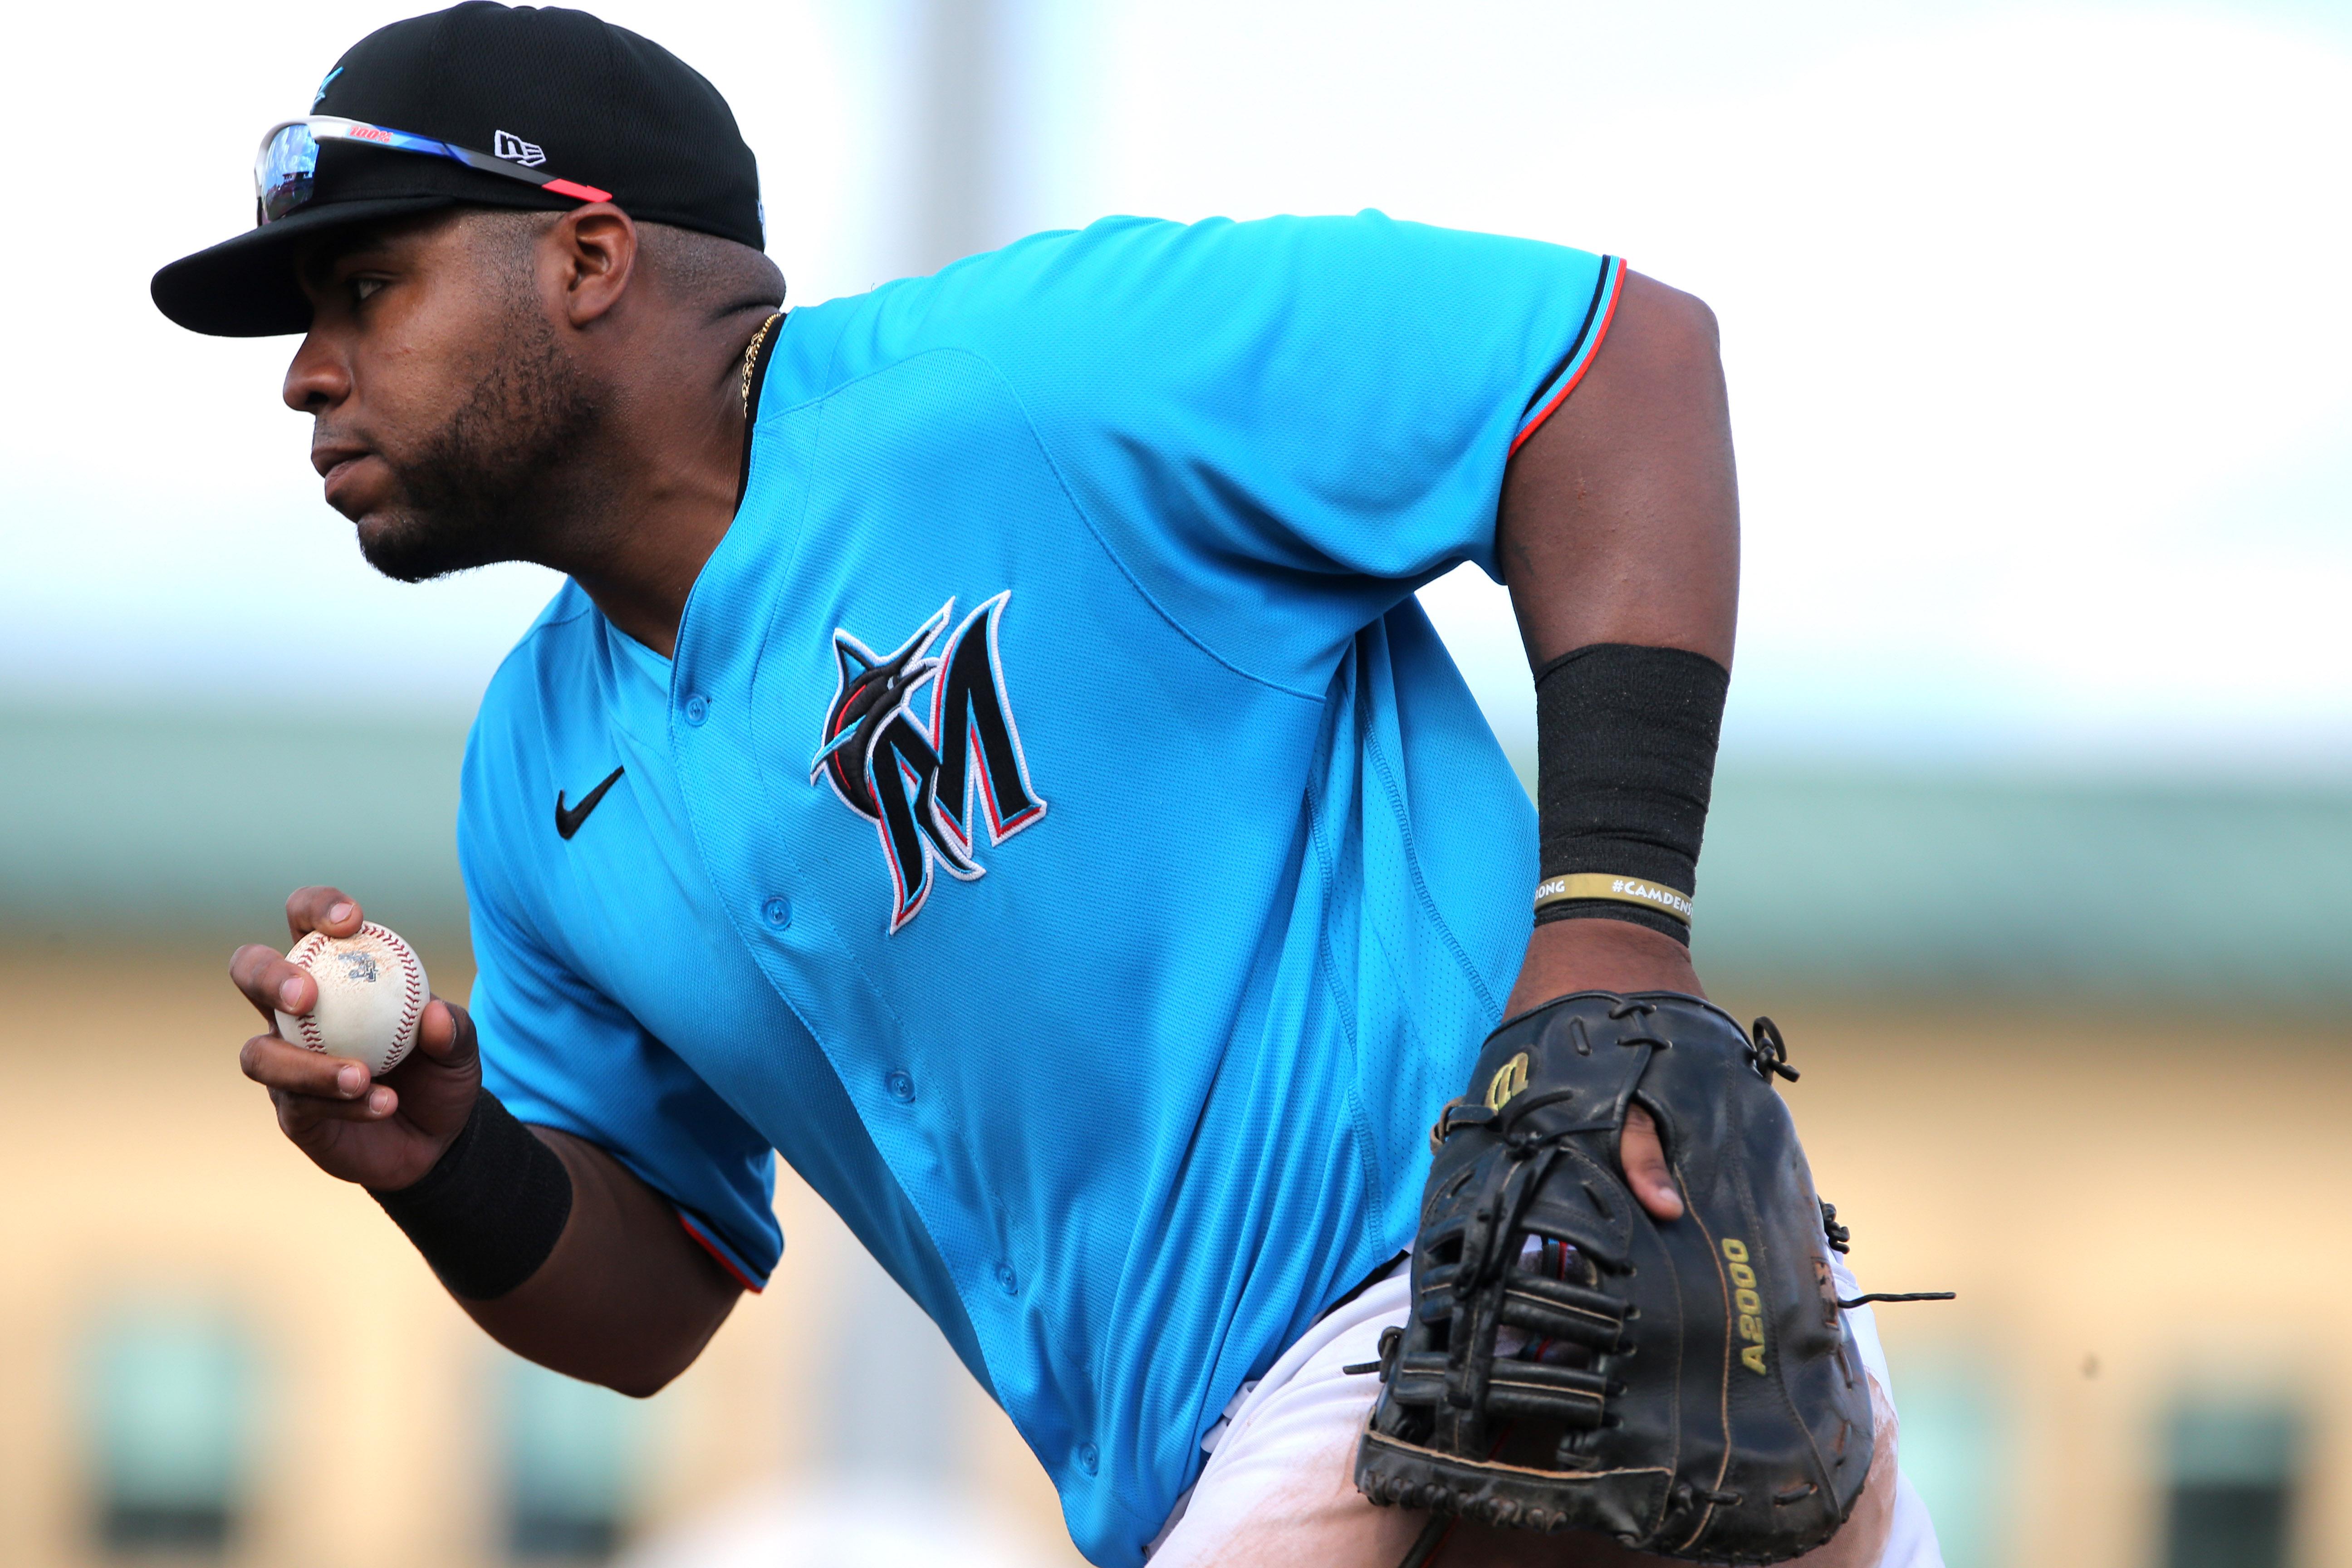 MLB: Spring Training-New York Mets at Miami Marlins